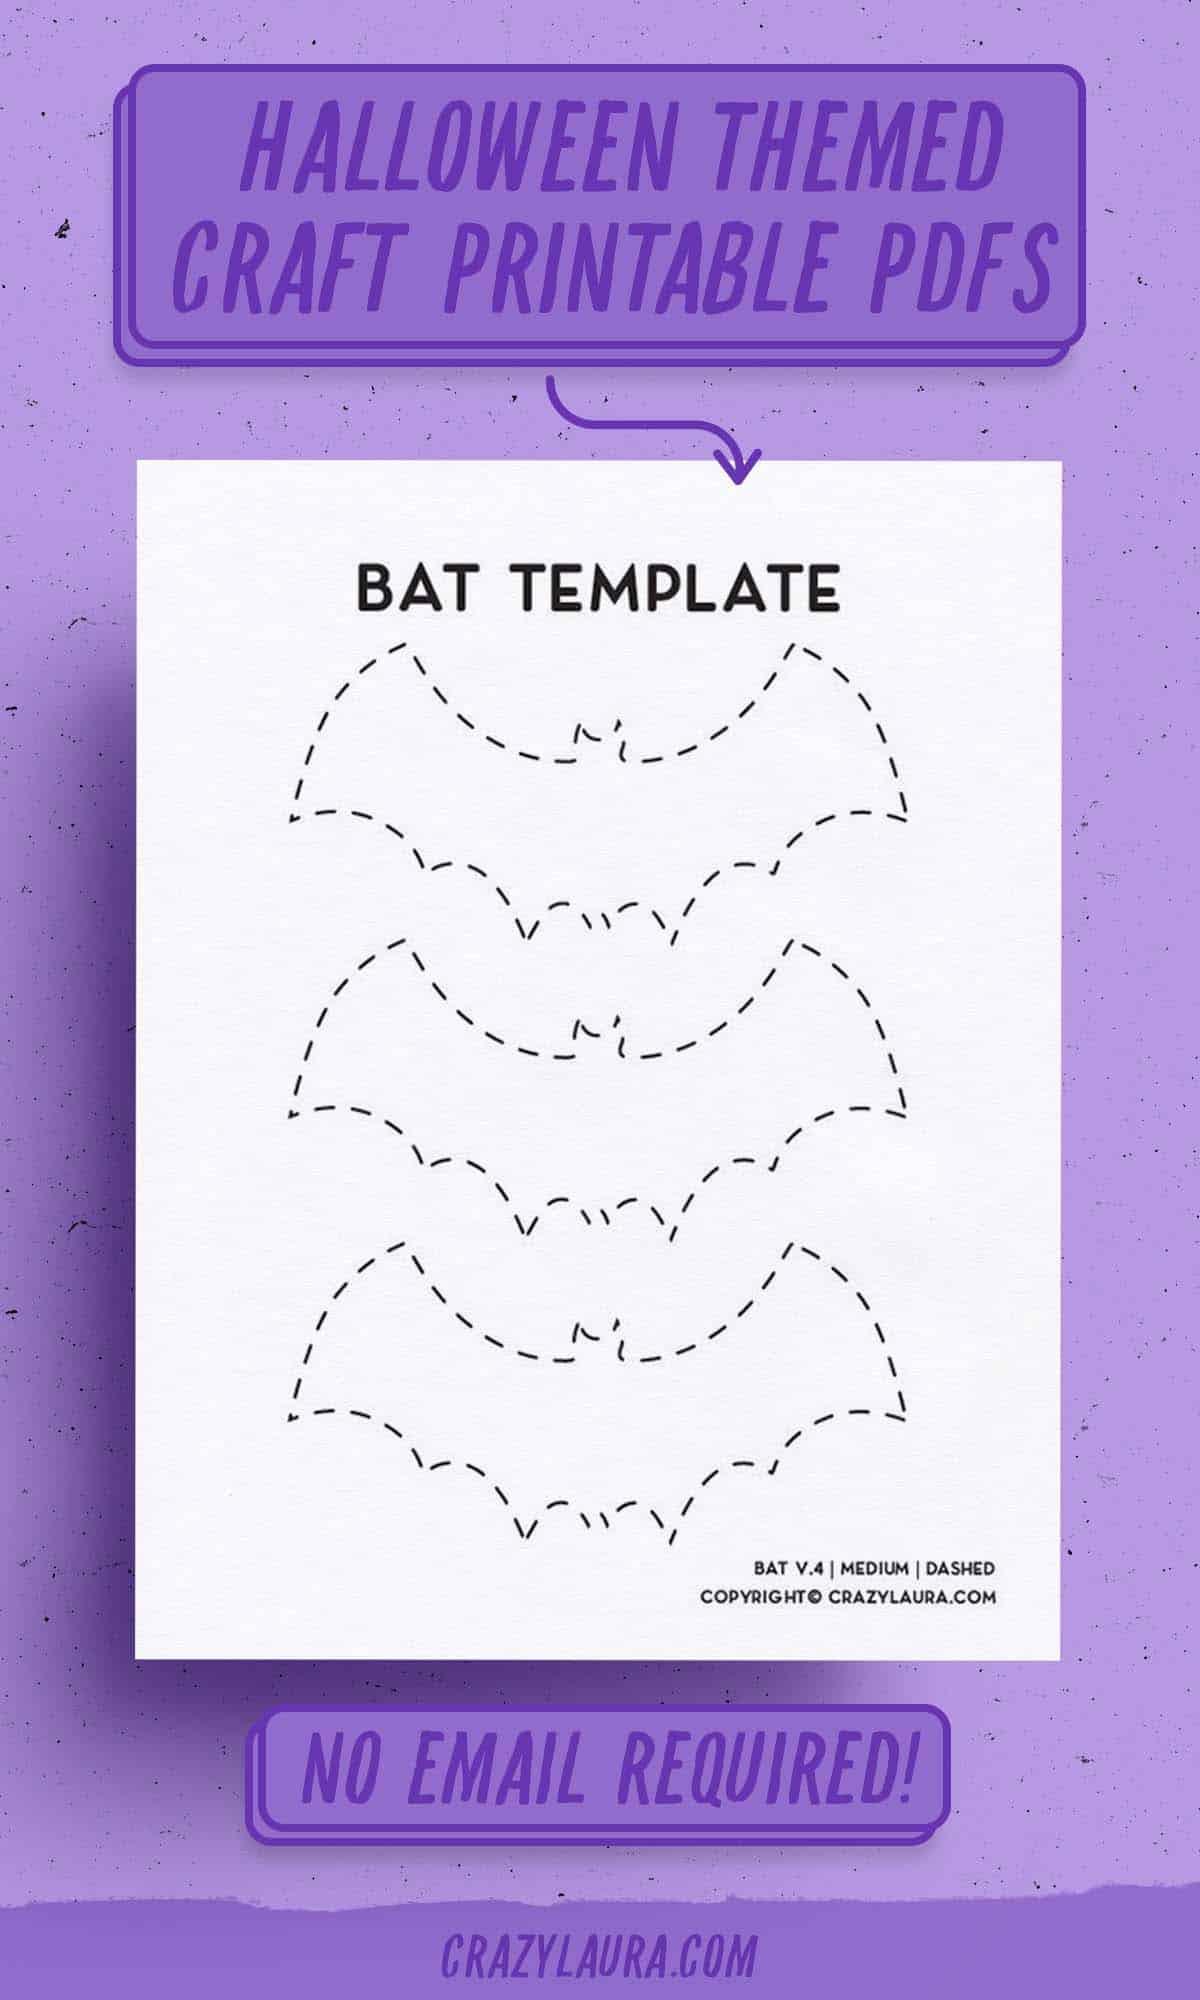 pdf sheet to print for halloween bat shape